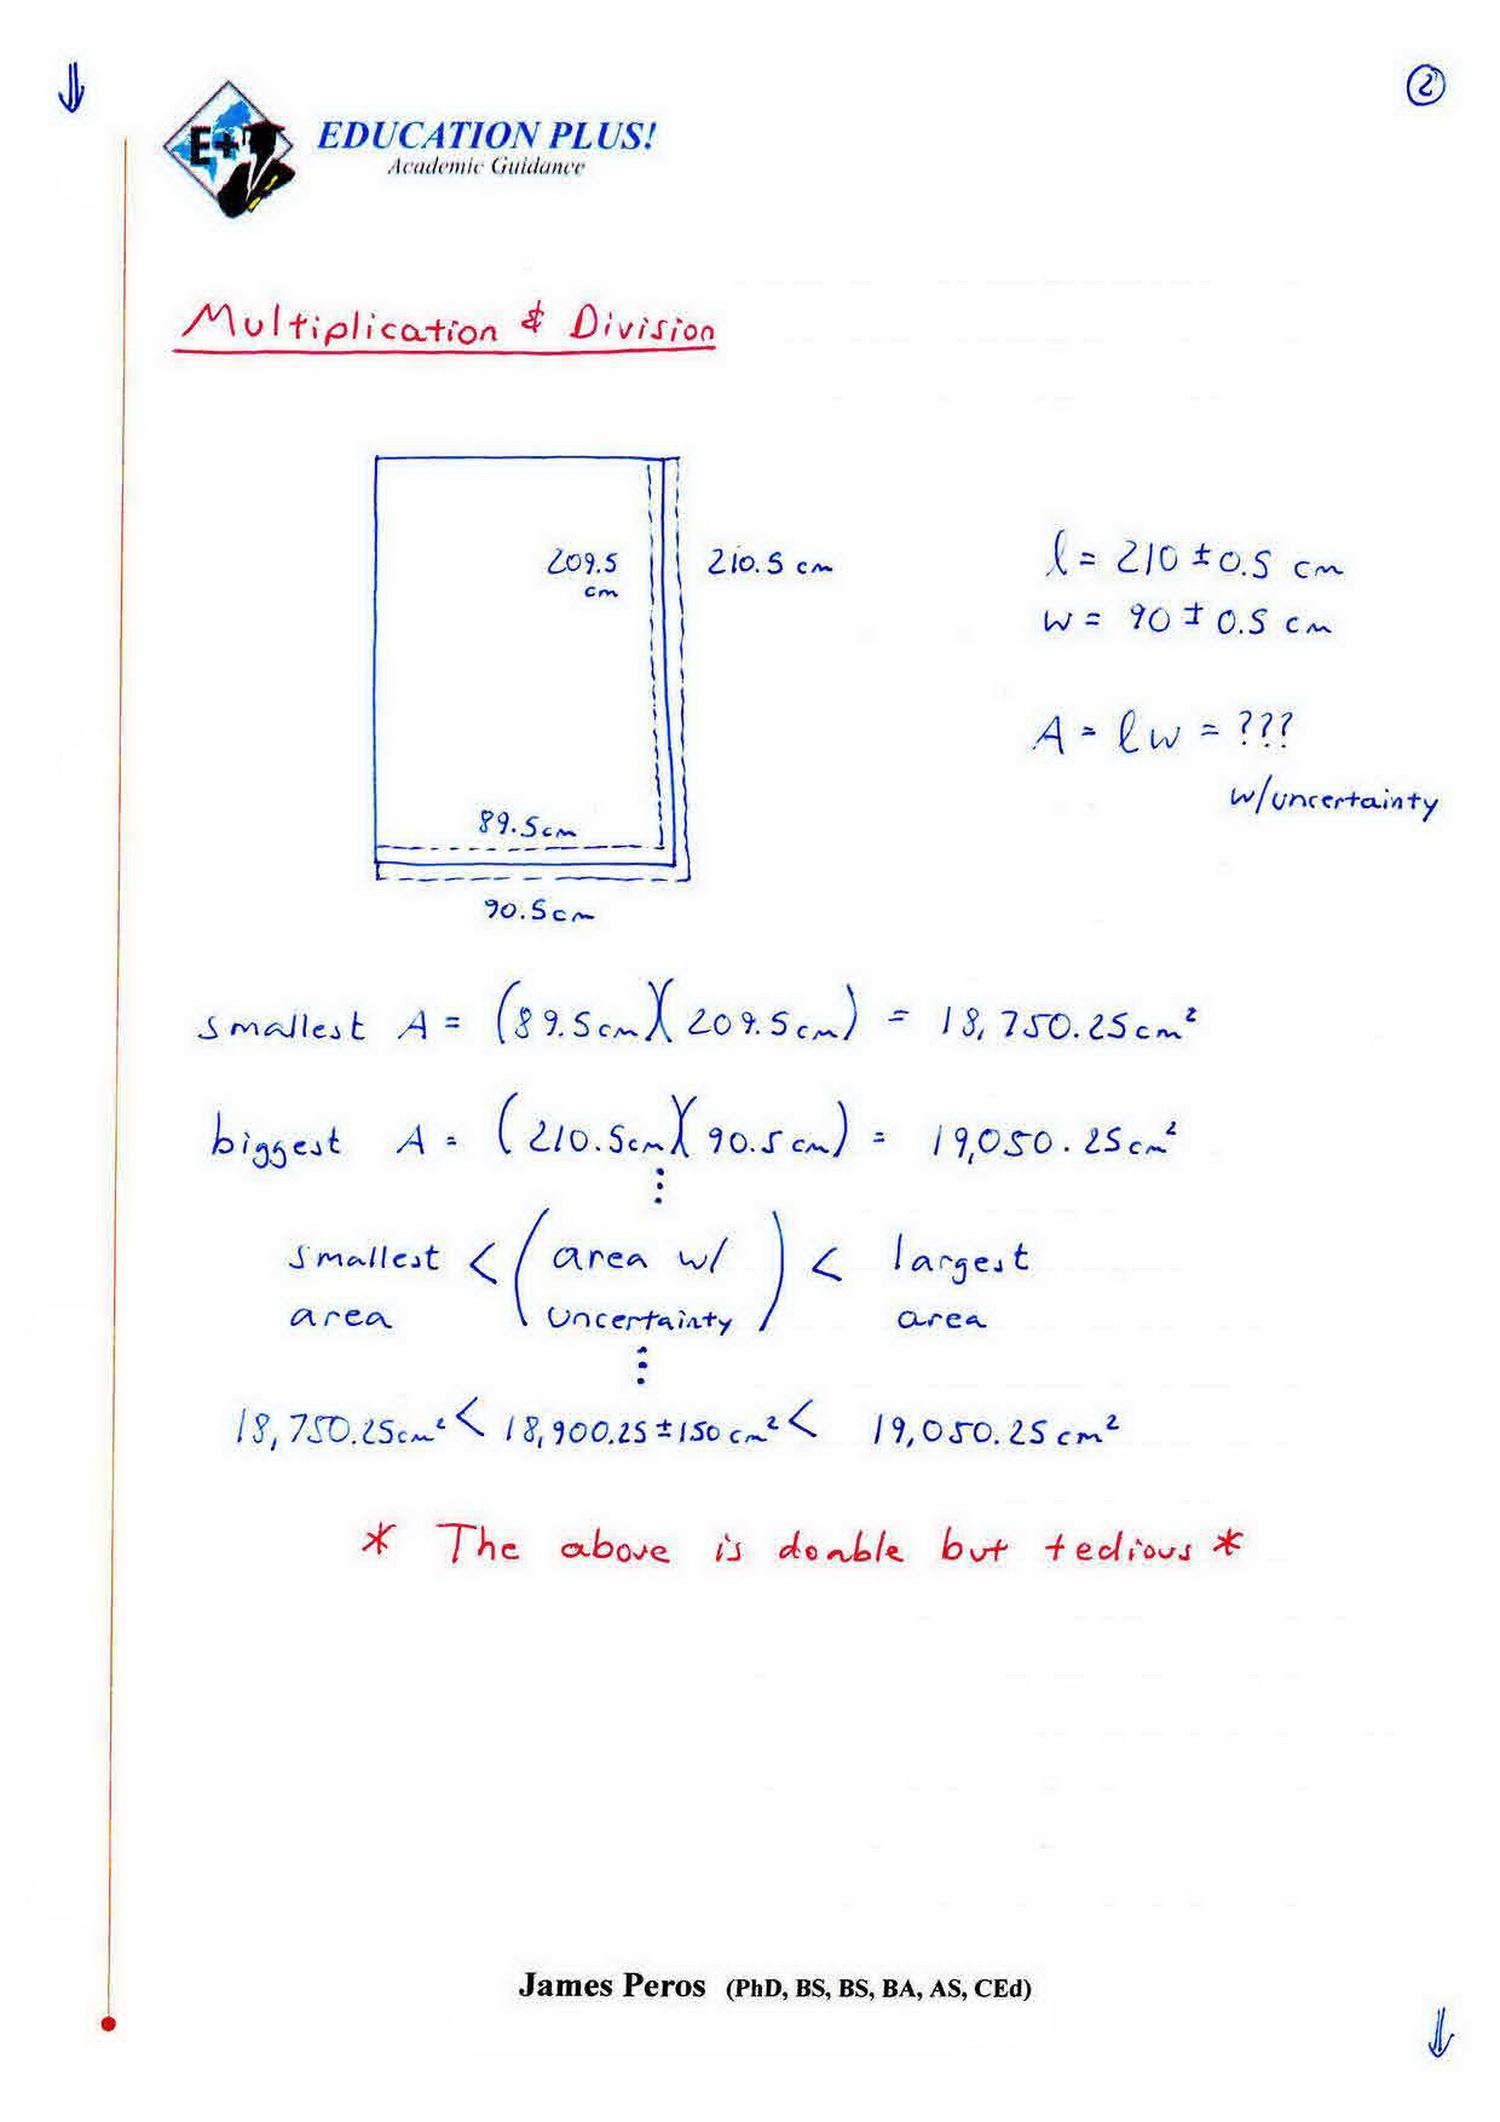 IB Chemistry SL & HL: 11.1 - Propagation of Uncertainties